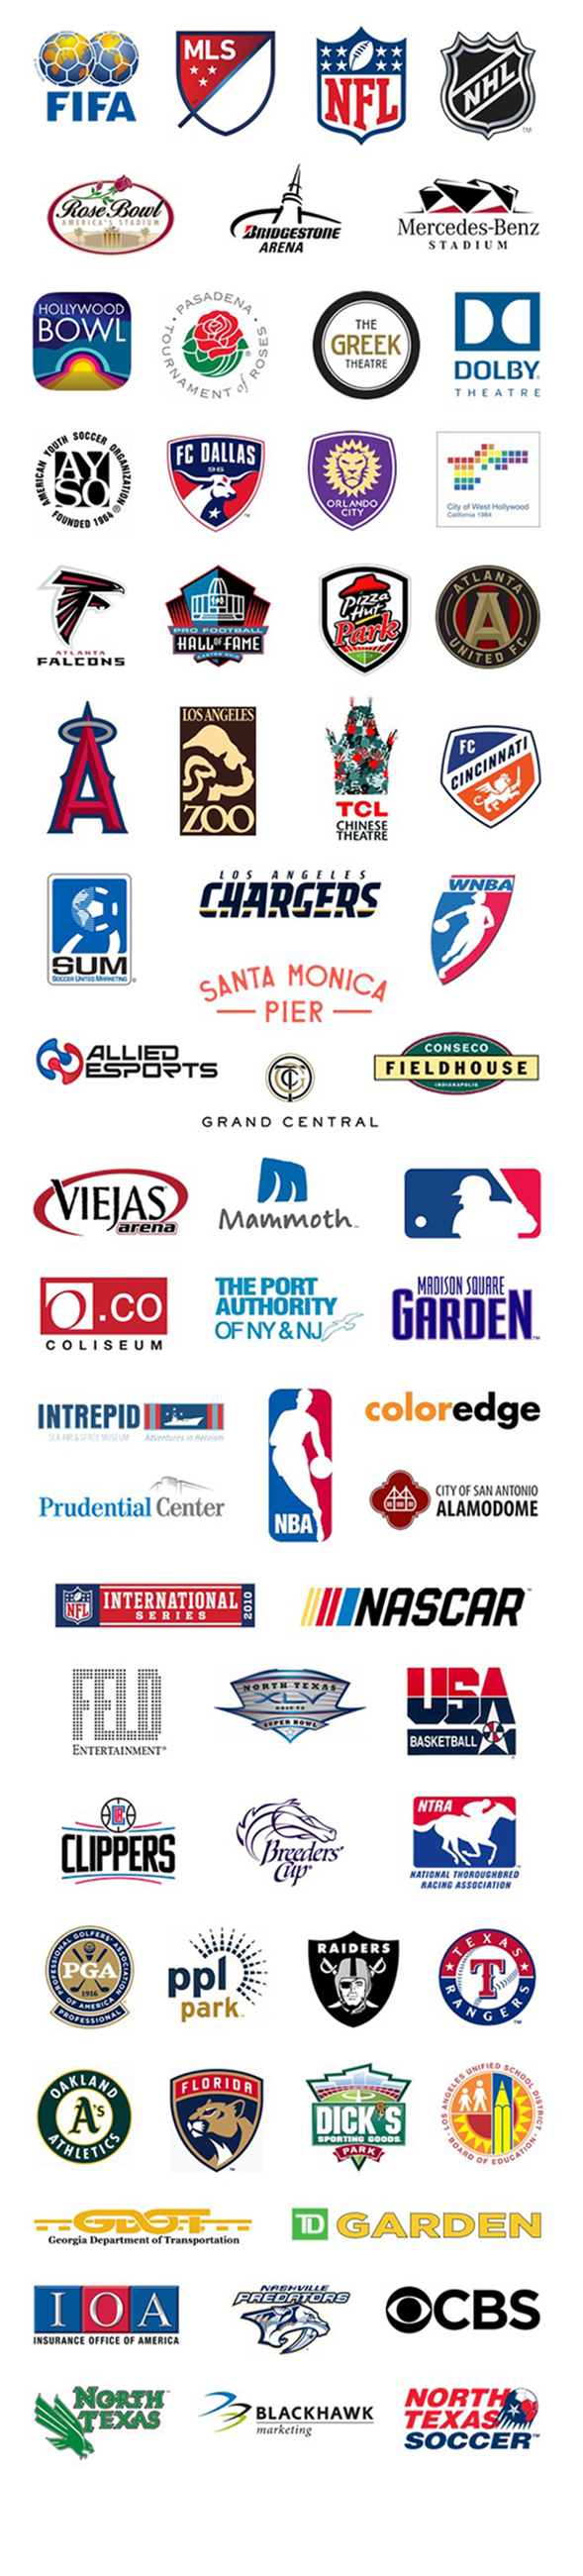 PP-Clients.jpg